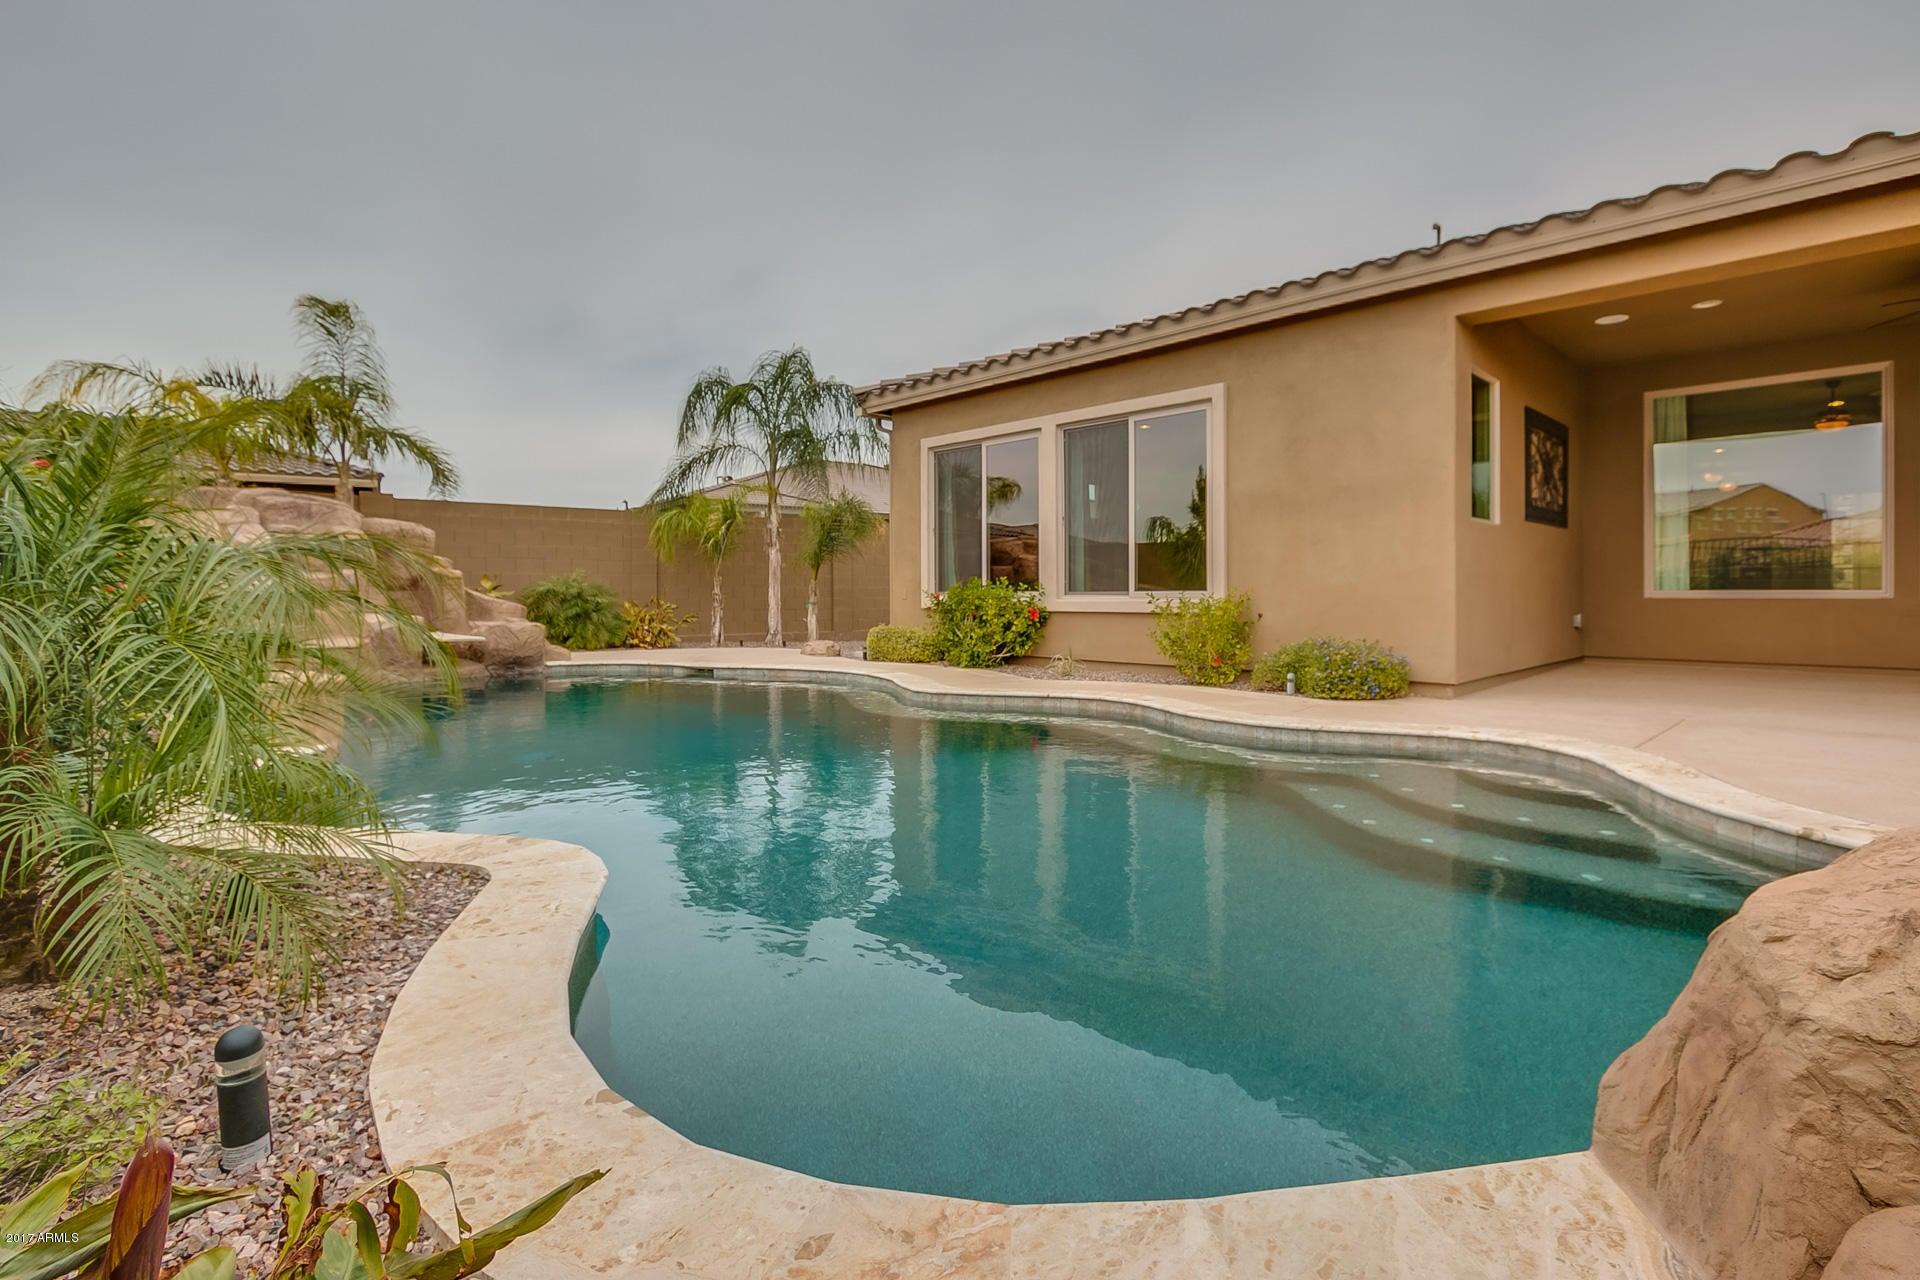 MLS 5571311 3755 E Azalea Drive, Gilbert, AZ 85298 Gilbert AZ Newly Built